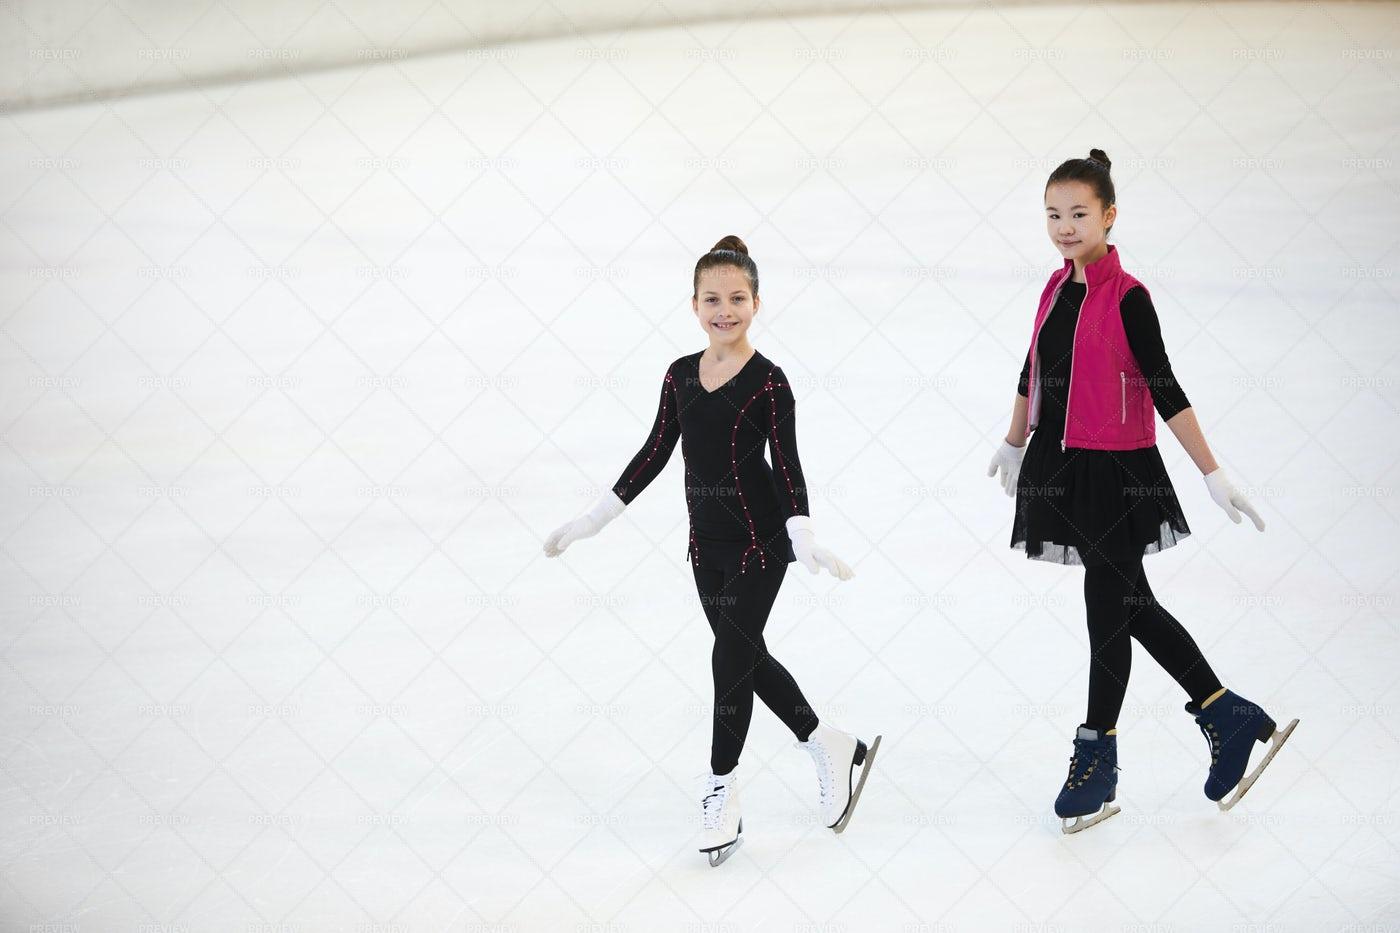 Girls Posing On Skating Rink: Stock Photos